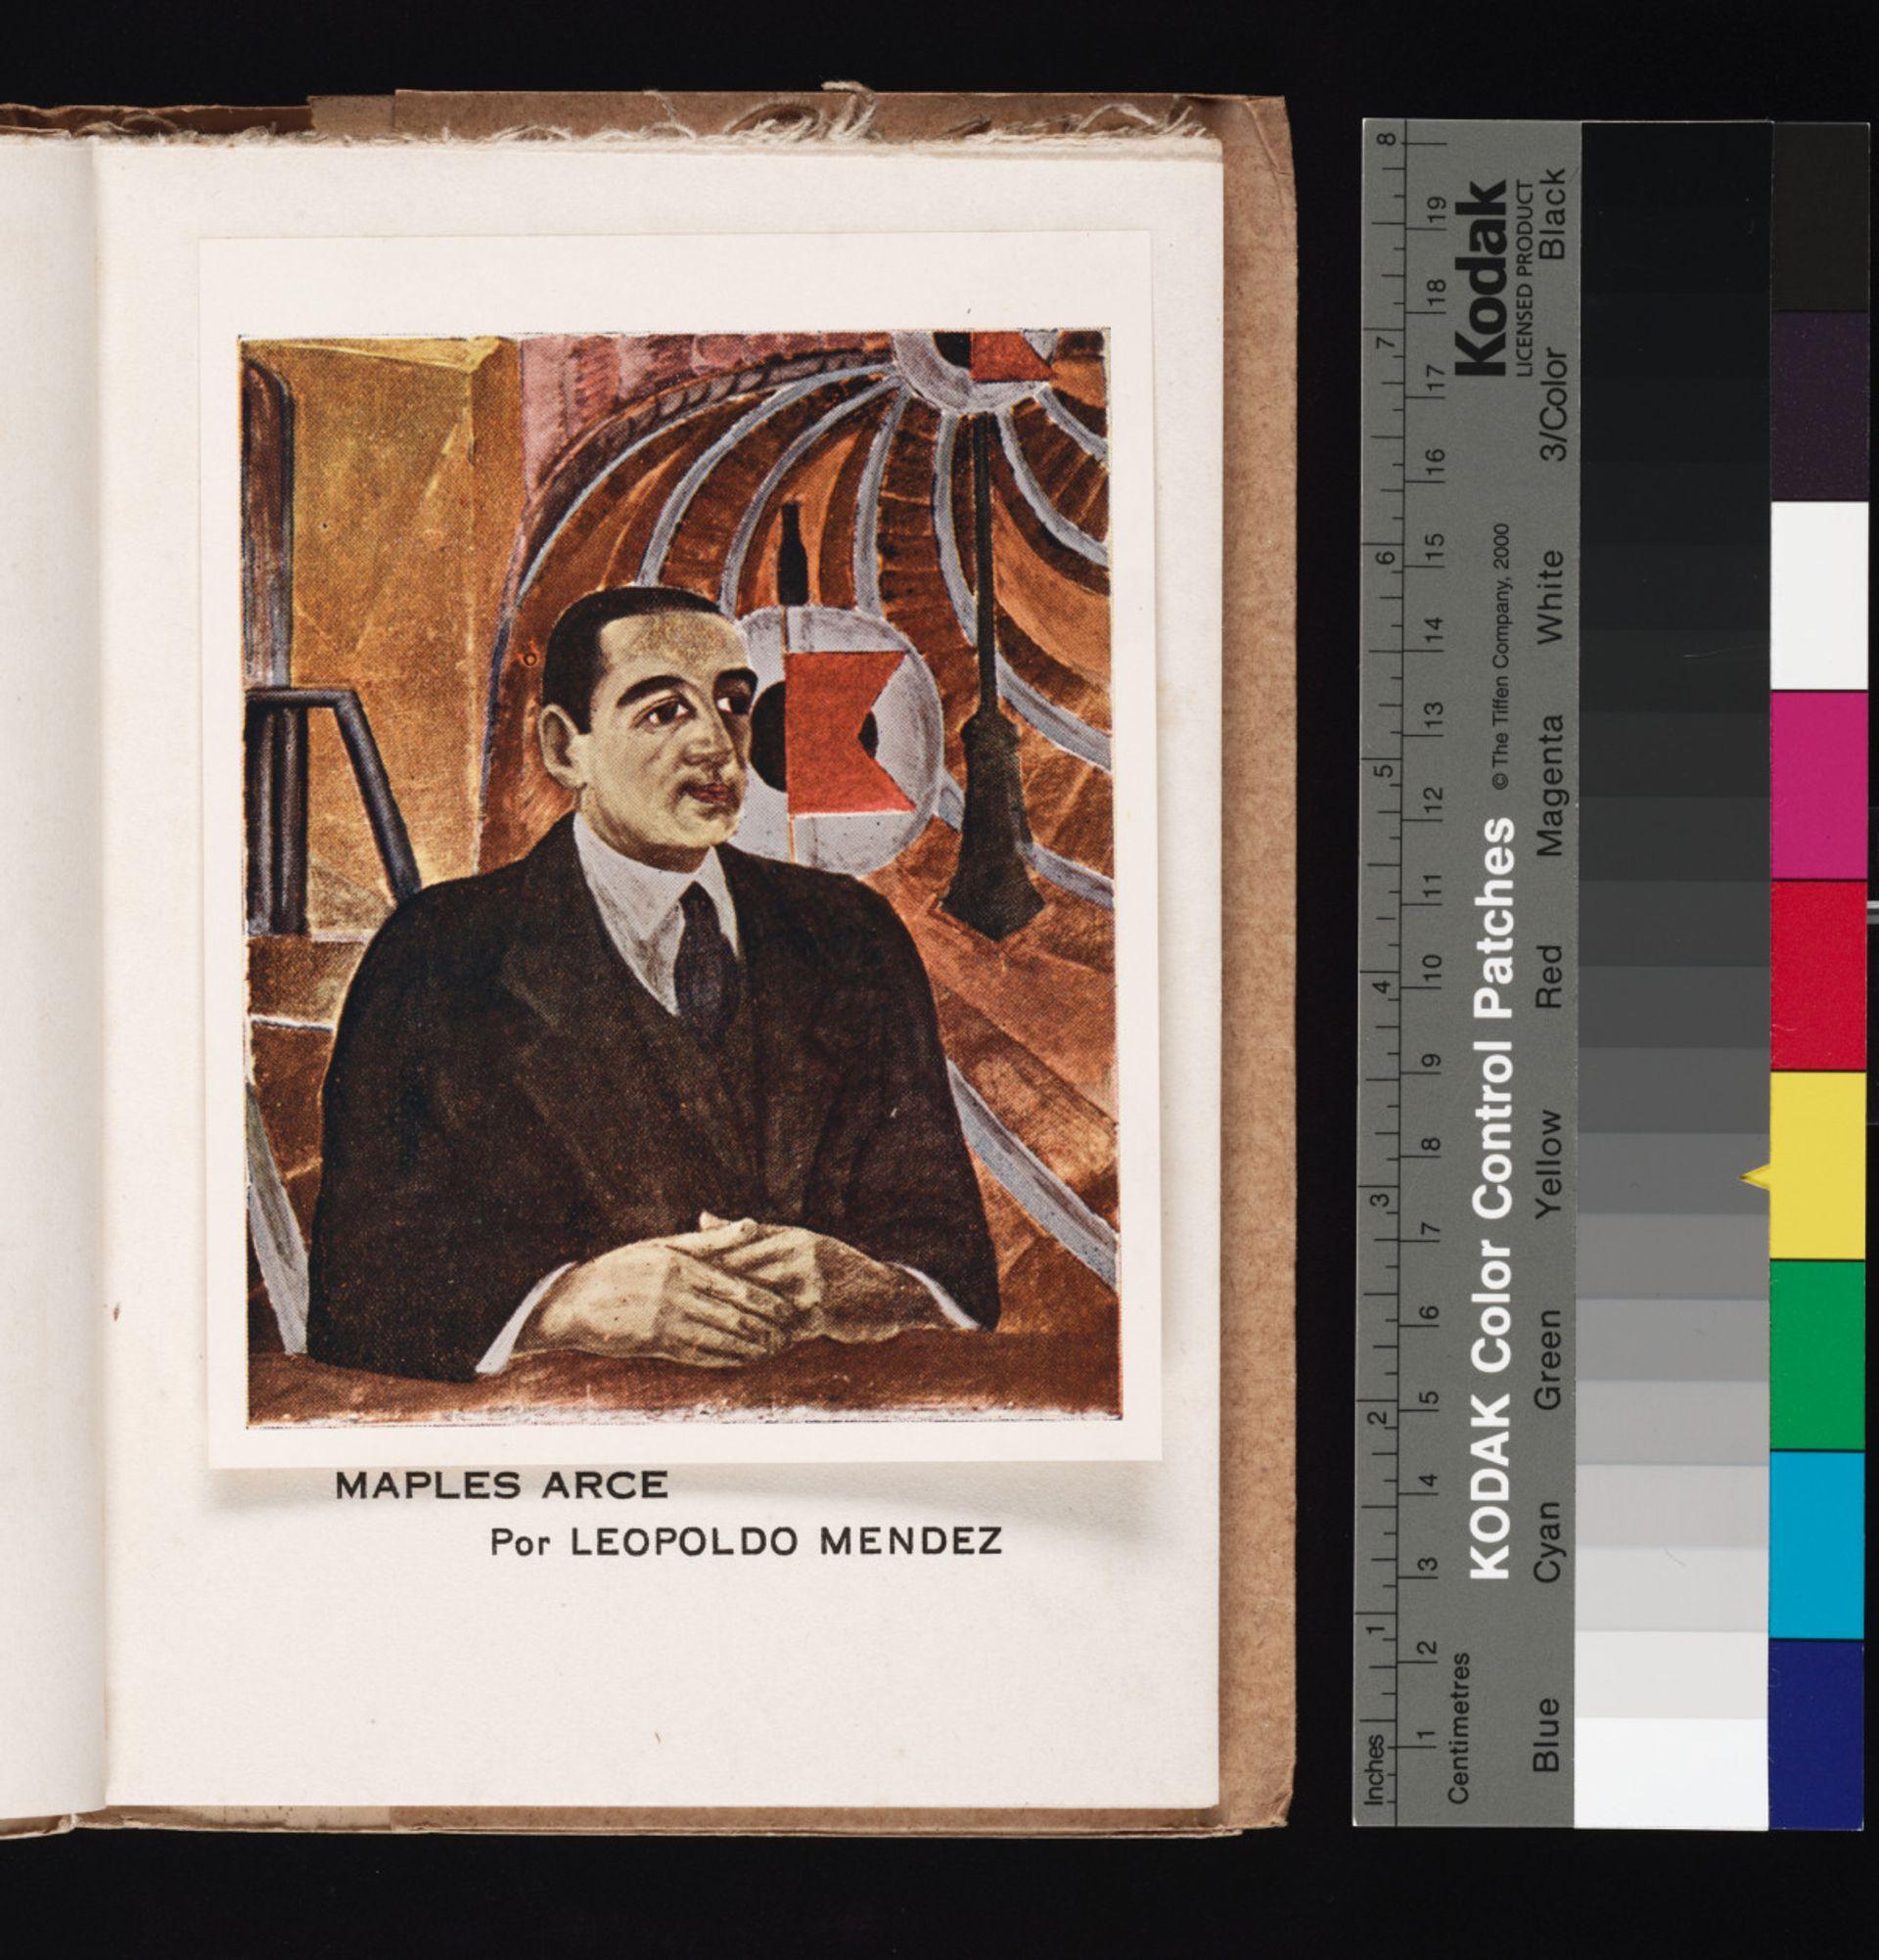 Leopoldo Méndez, Retrato de Manuel Maples Arce. Frontispiece for Manuel Maples Arce, Poemas interdictos (1927) Courtesy of the Beinecke Rare Book and Manuscript Library, Yale University. Reproduced by Permission from Pablo Mendez